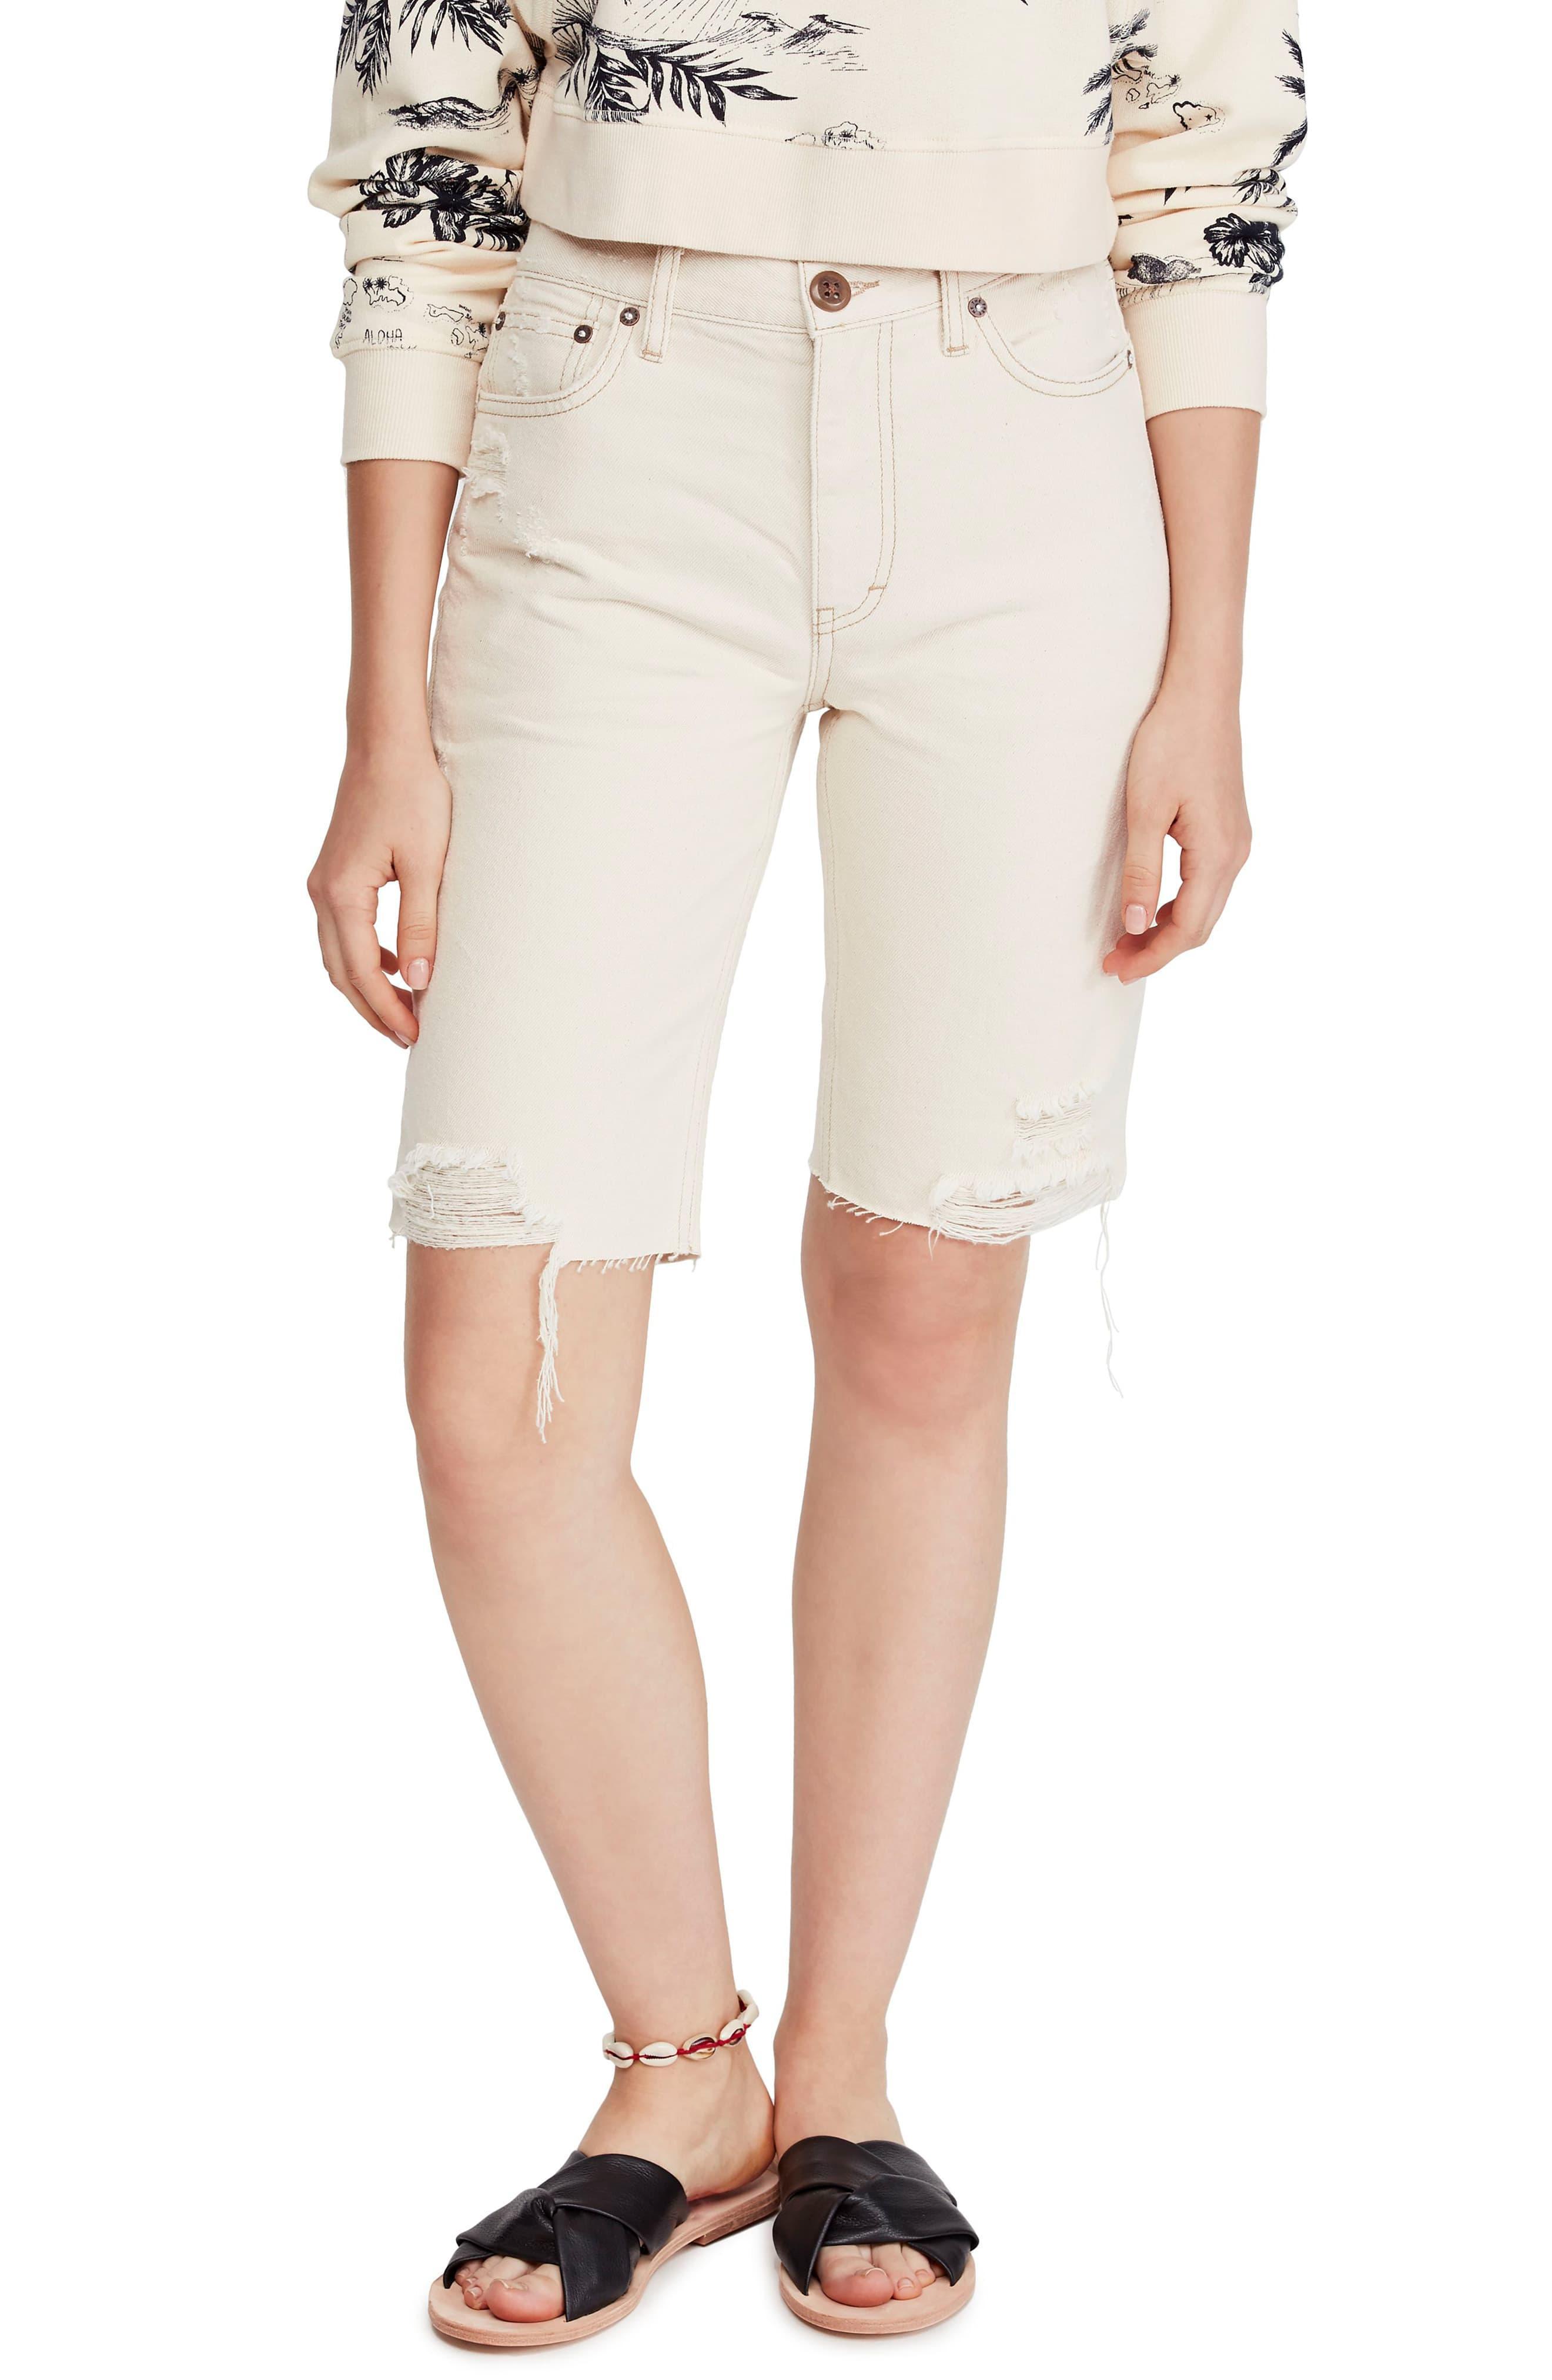 e2bd60dbd37c Free People Caroline Cutoff Denim Shorts in Natural - Lyst